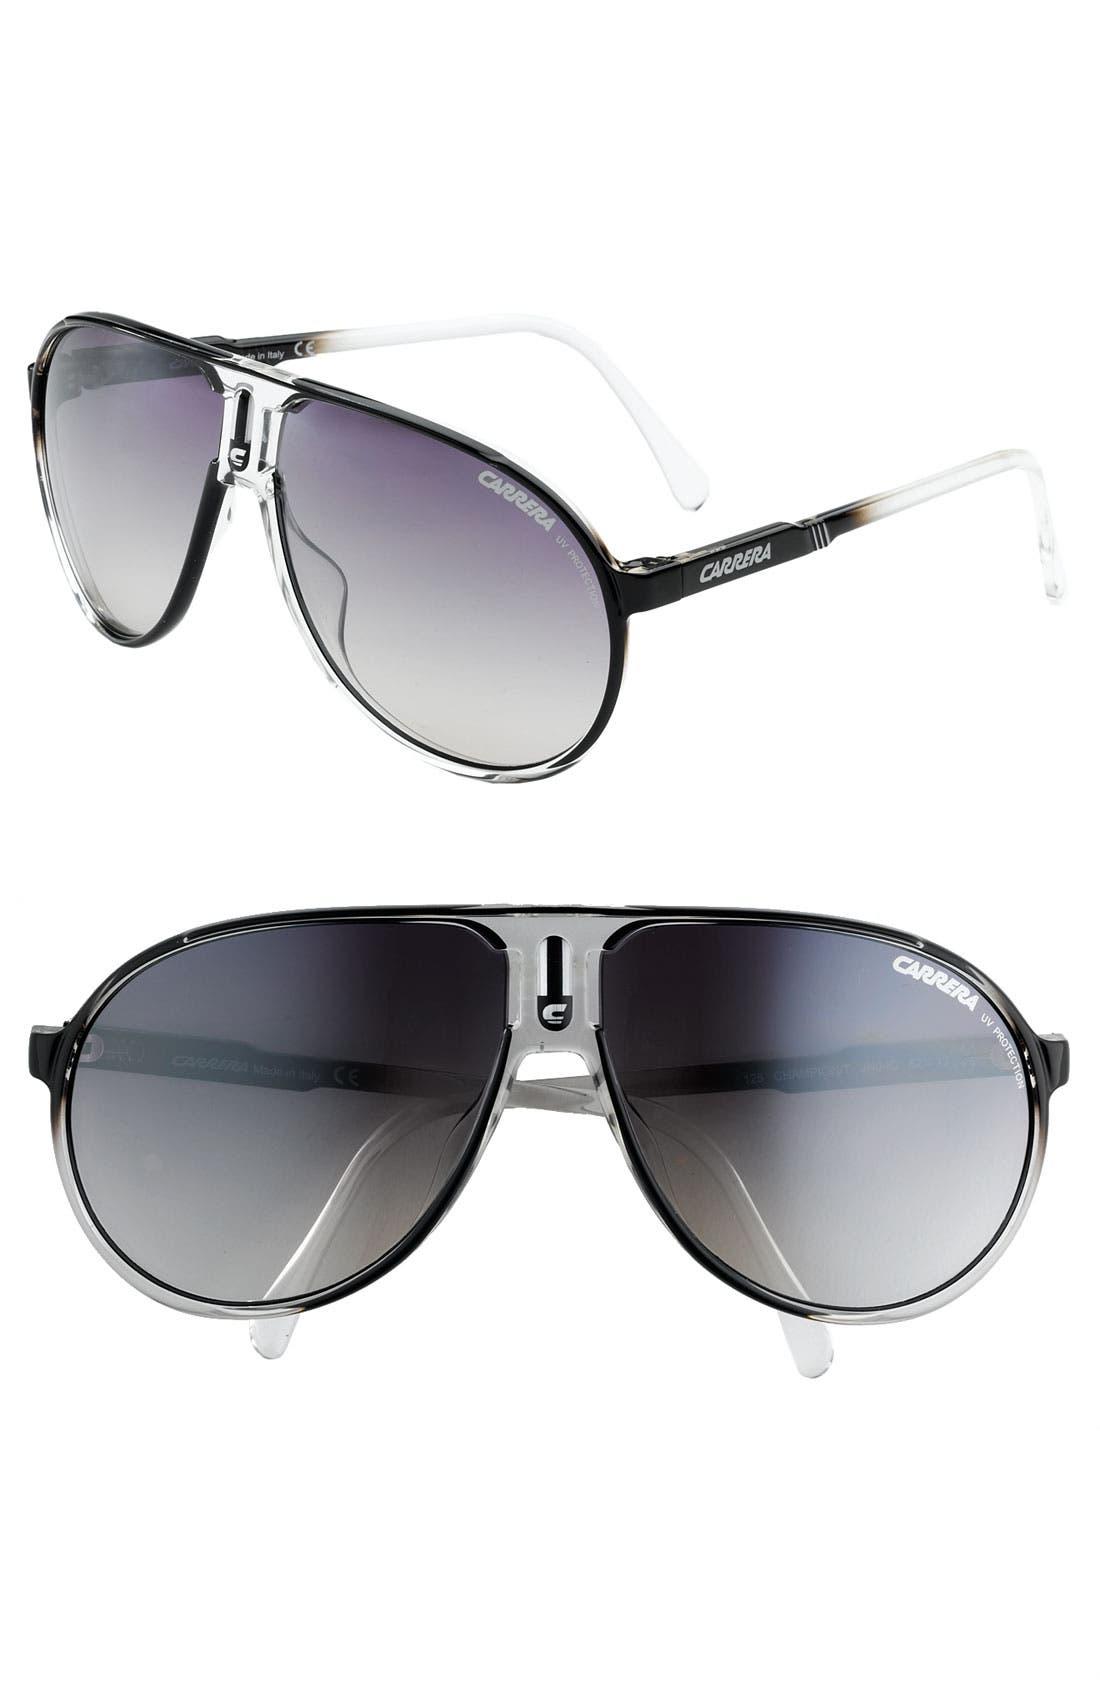 Alternate Image 1 Selected - Carrera Eyewear 'Champion' Aviator Sunglasses